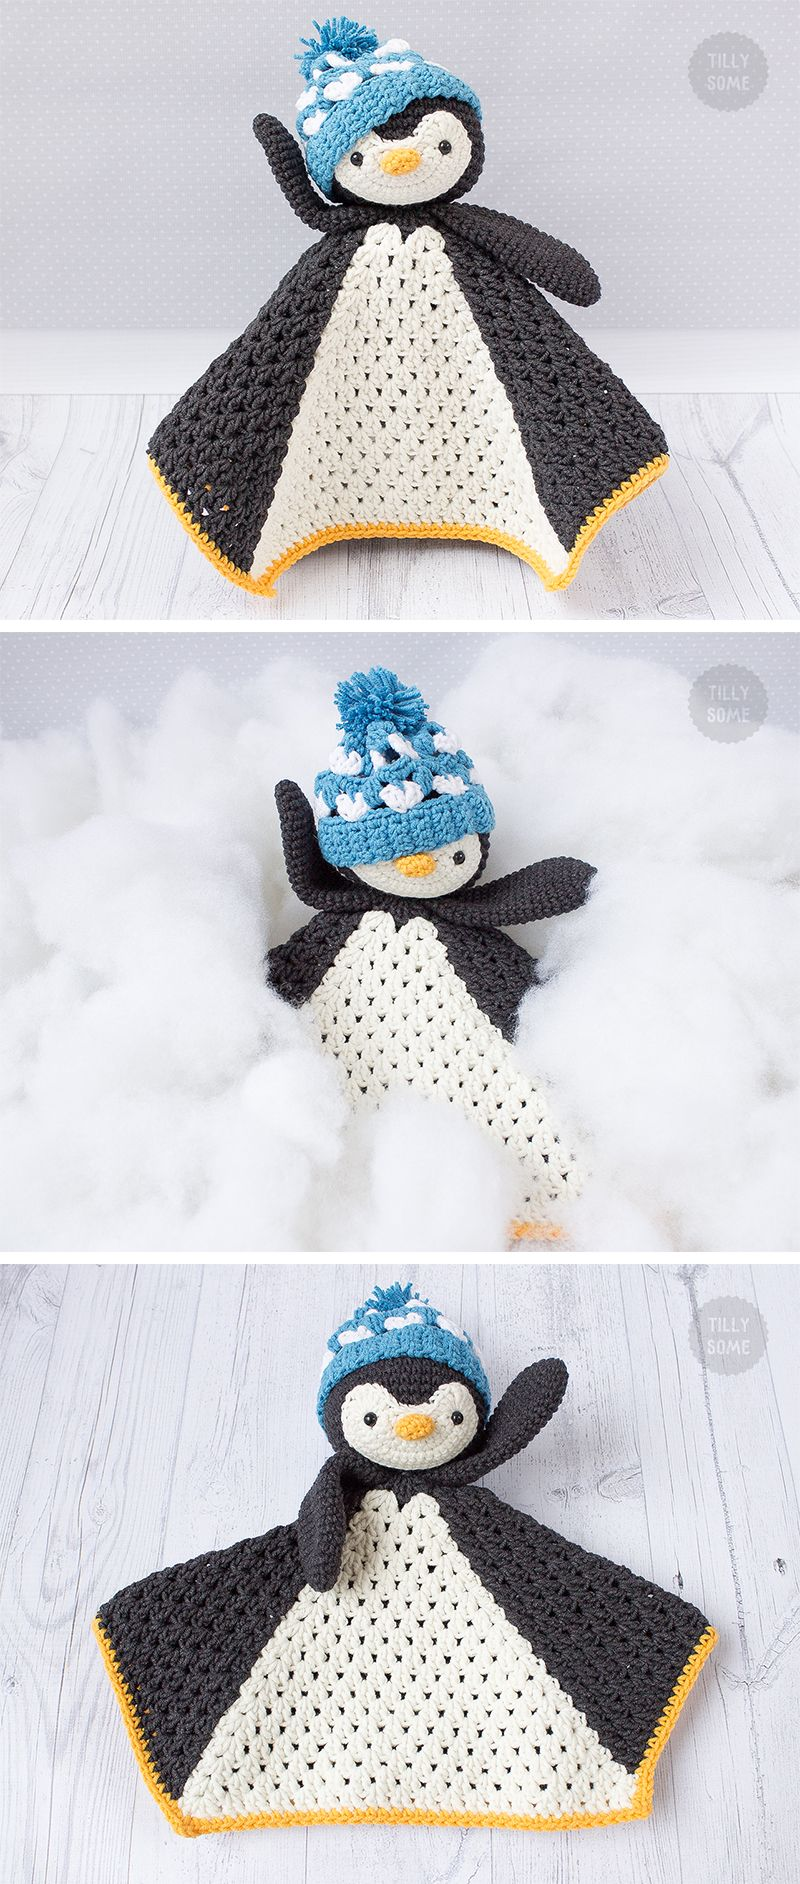 Po the Penguin Lovey Pattern | Security Blanket | Crochet Lovey ...